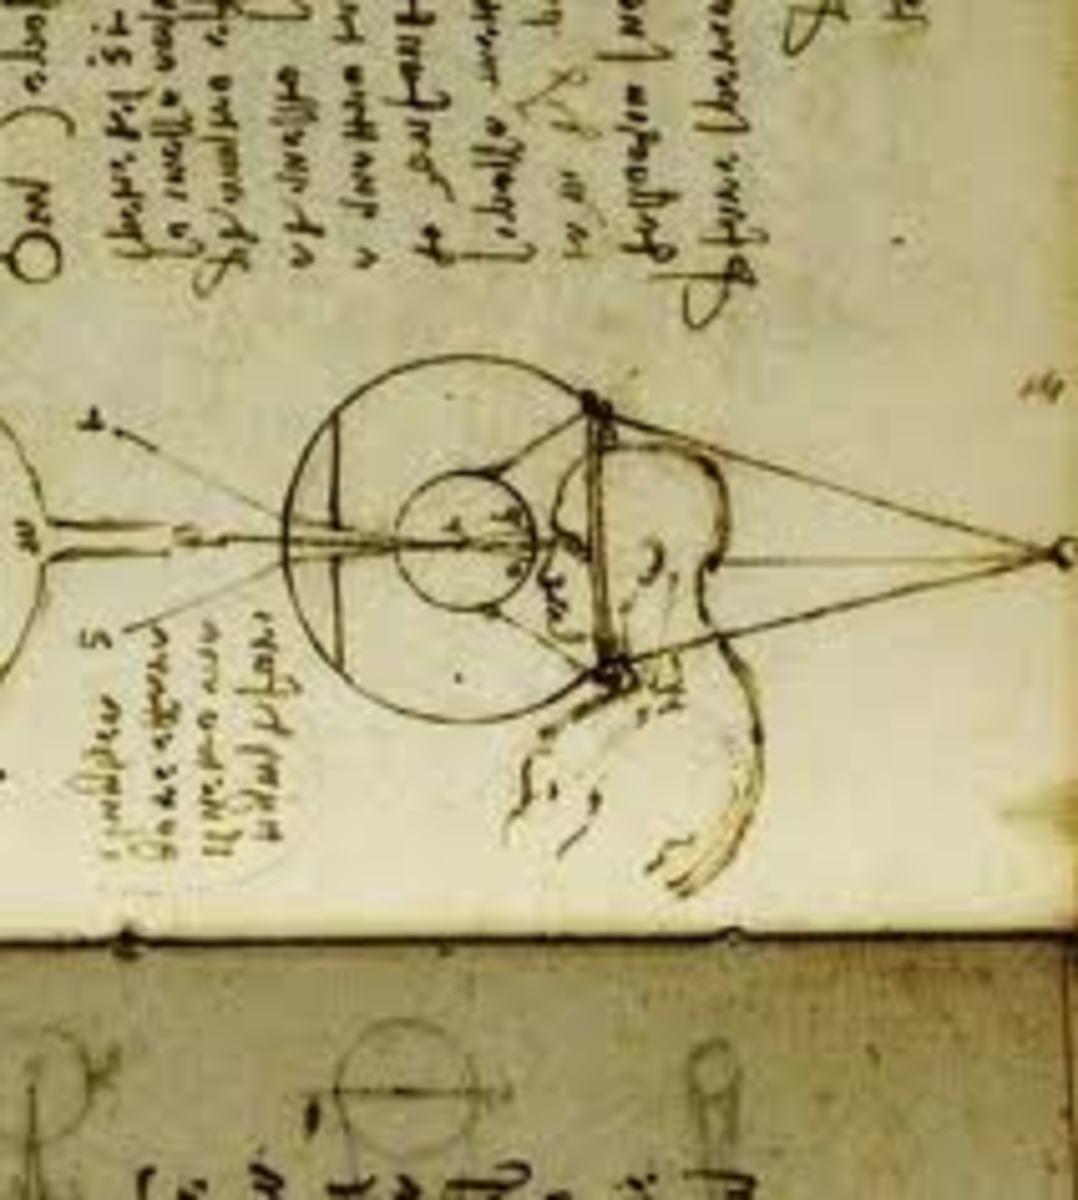 Leonardo's Drawing of the Human Eye